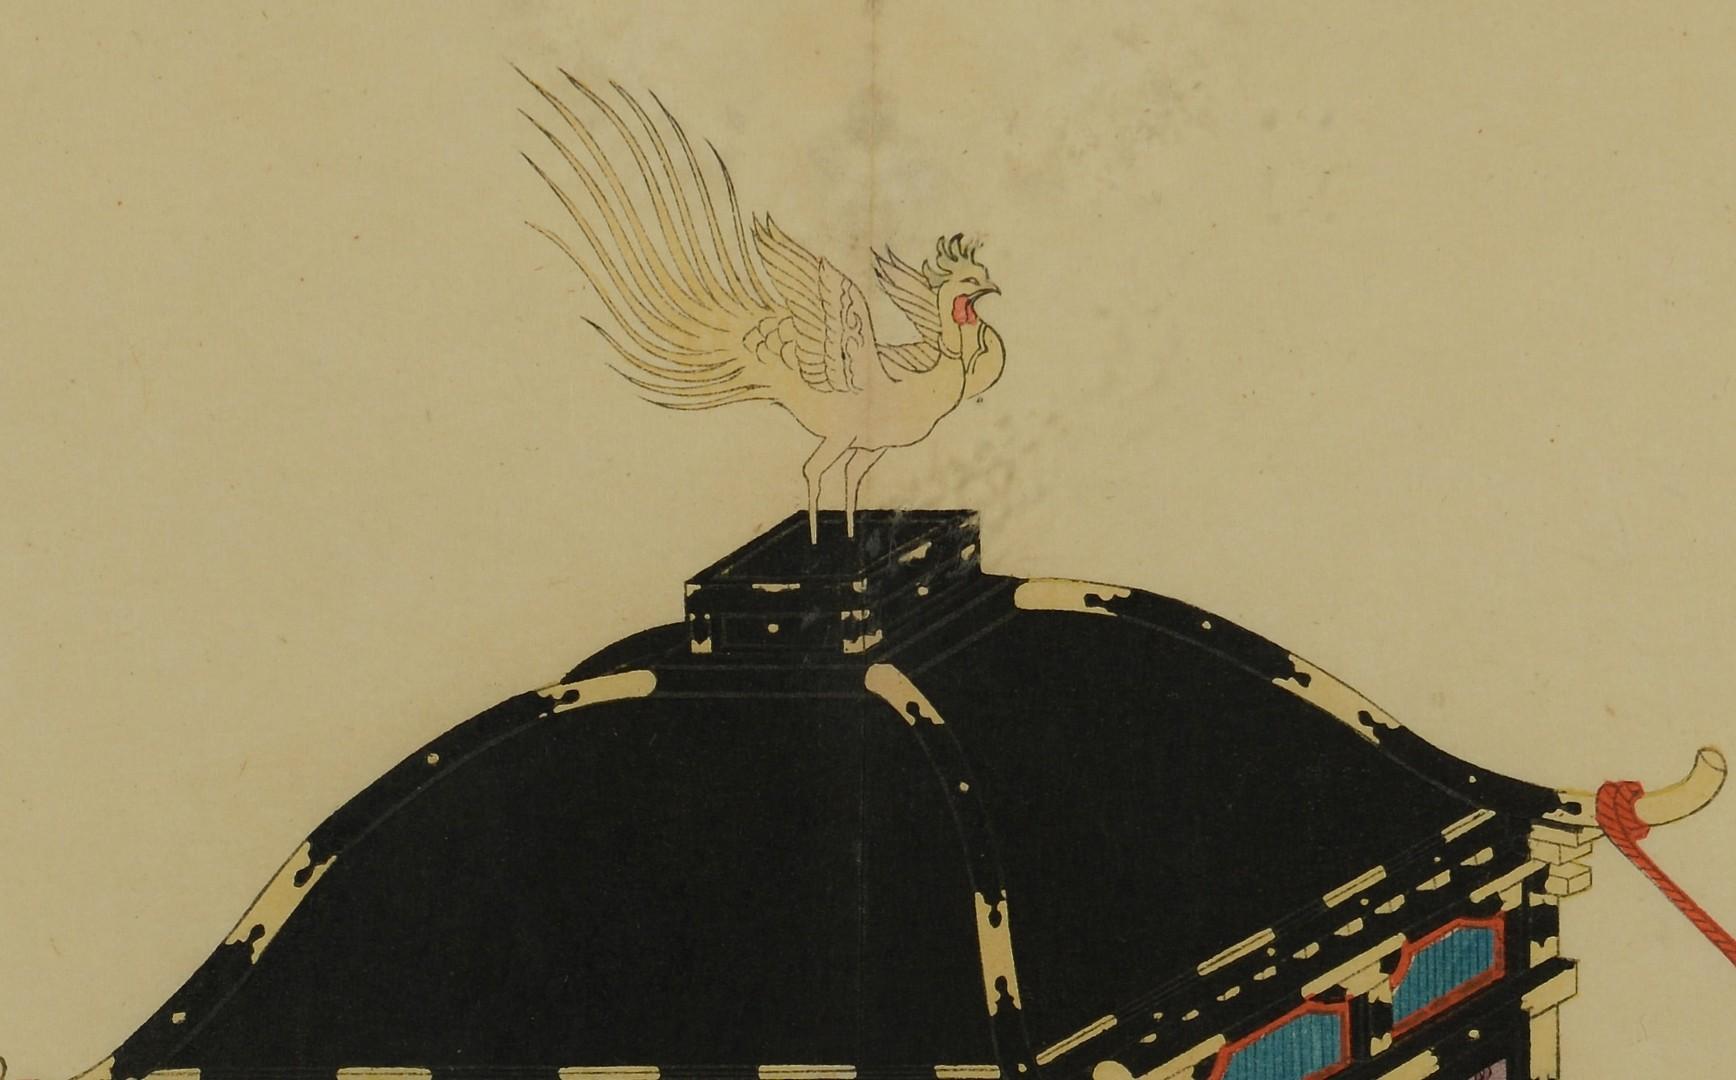 Lot 3383154: Japanese gouache – Norimono or sedan chair